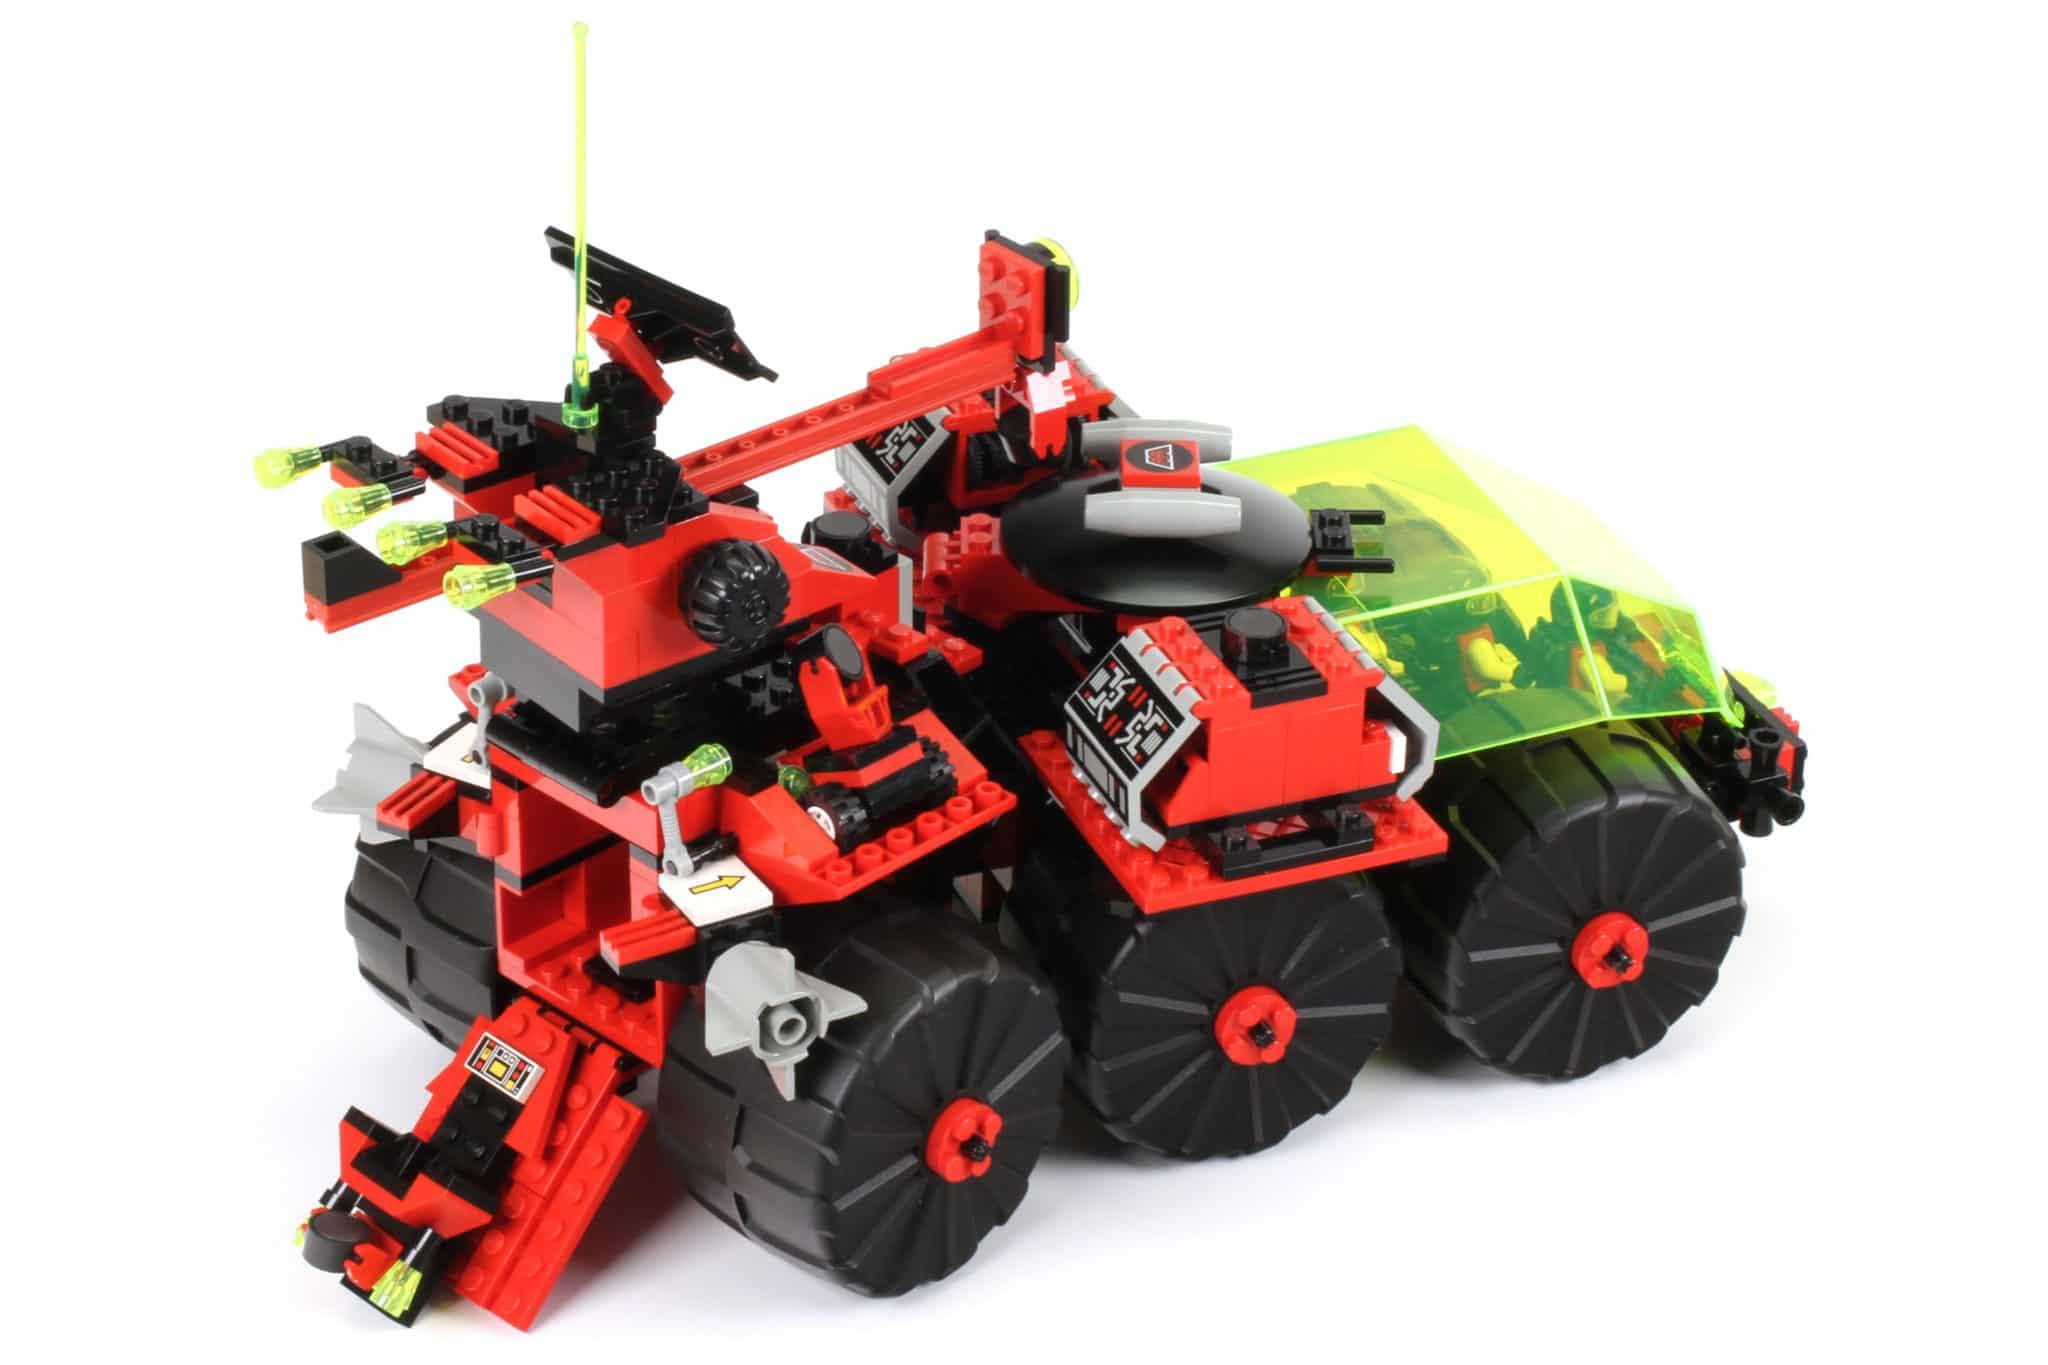 LEGO 6989 M Tron Mega Core Magnetizer 8